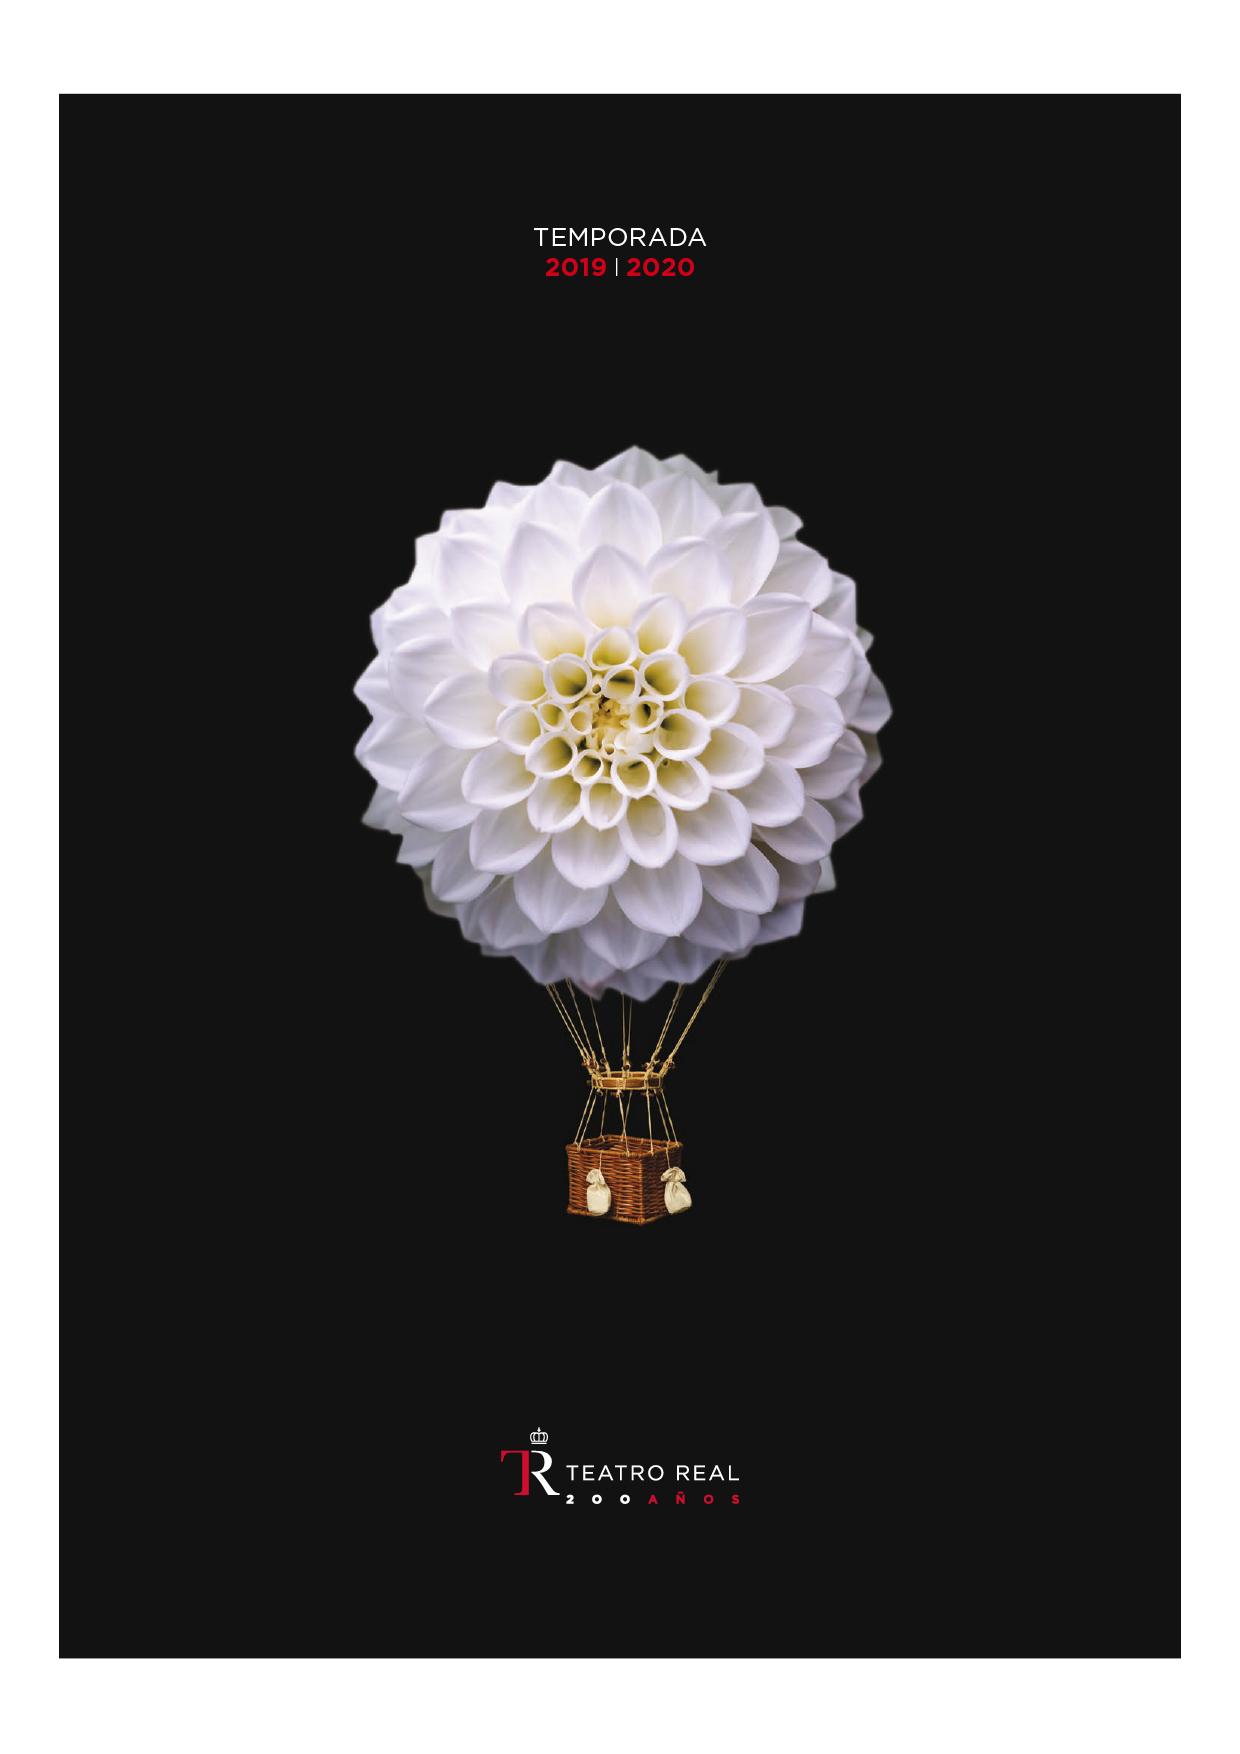 Teatro Real. Temporada de ópera 2019/2020 by Estudio Pep Carrió - Creative Work